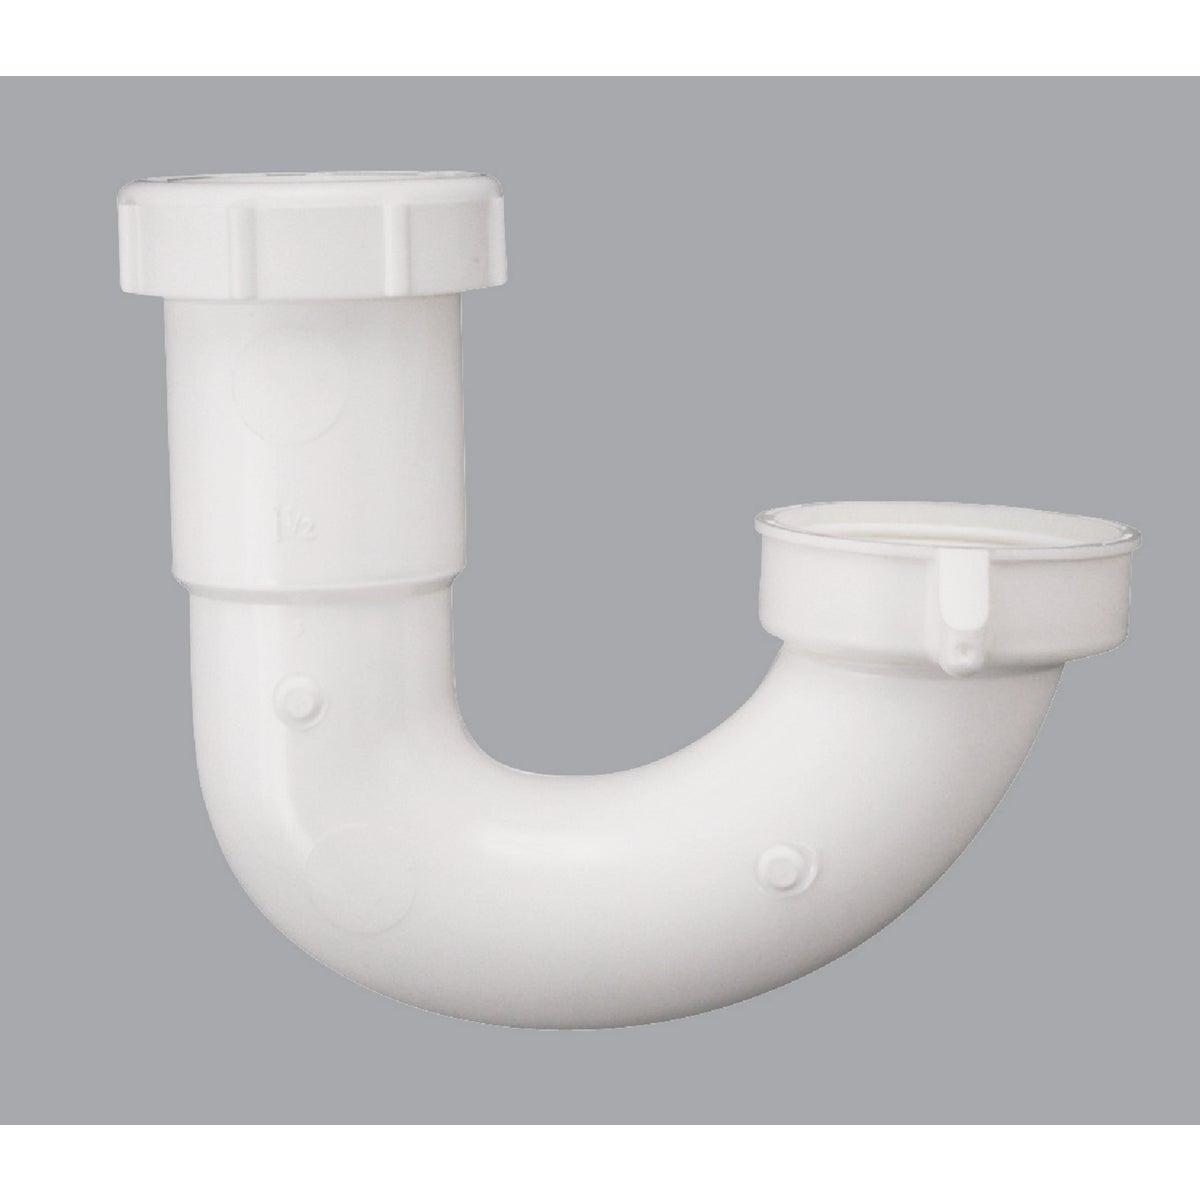 1-1/2 WHT PLASTIC J-BEND - 494909 by Plumb Pak/keeney Mfg